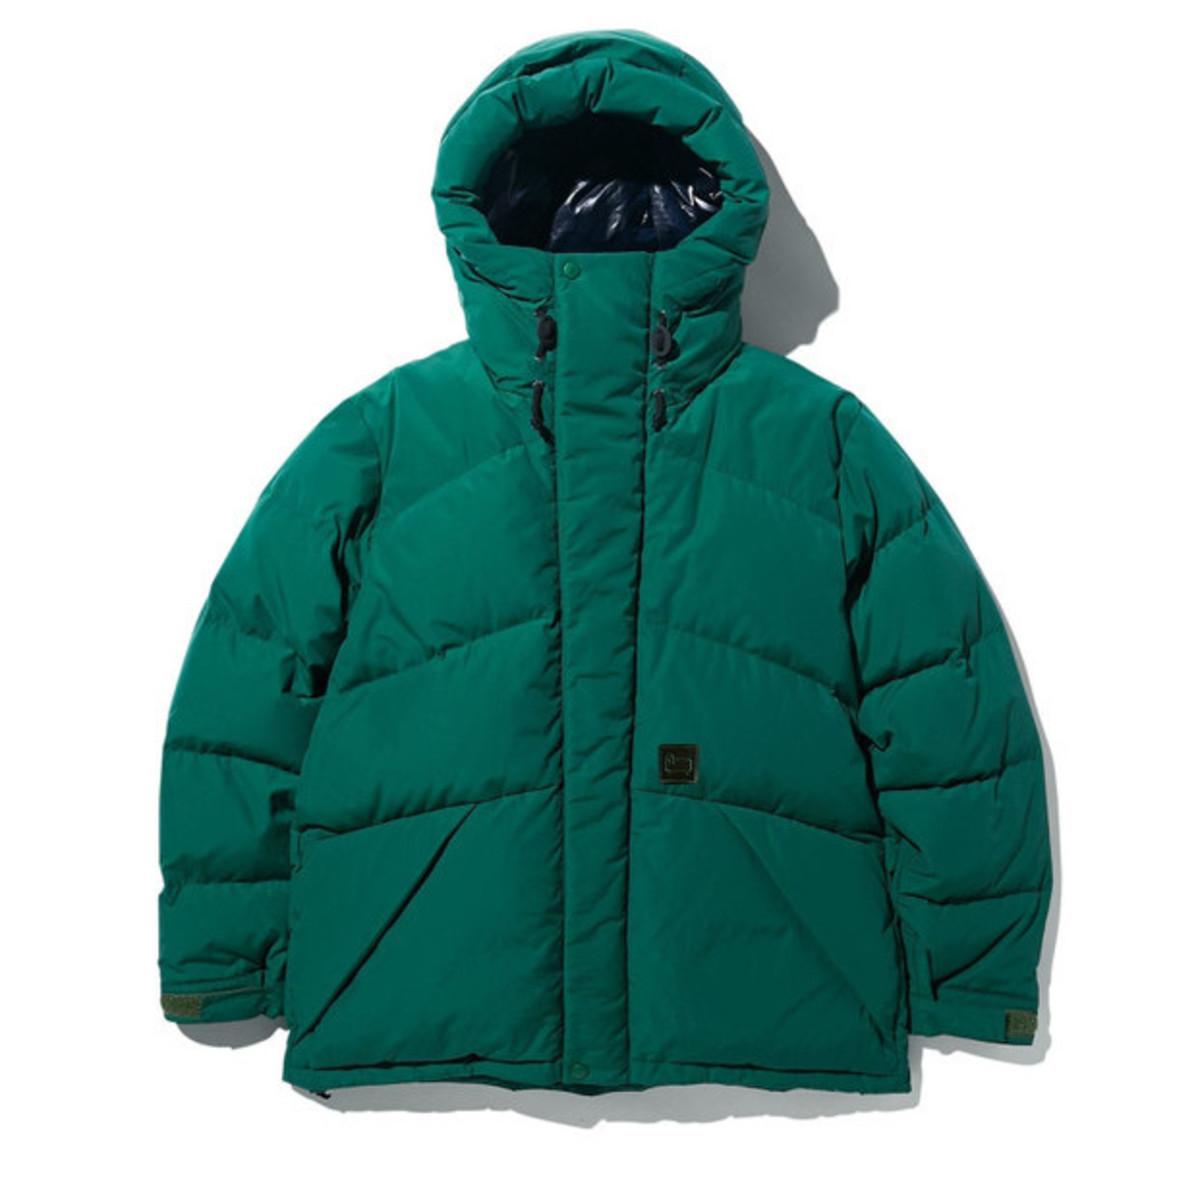 Woolrich Fall/Winter 2020